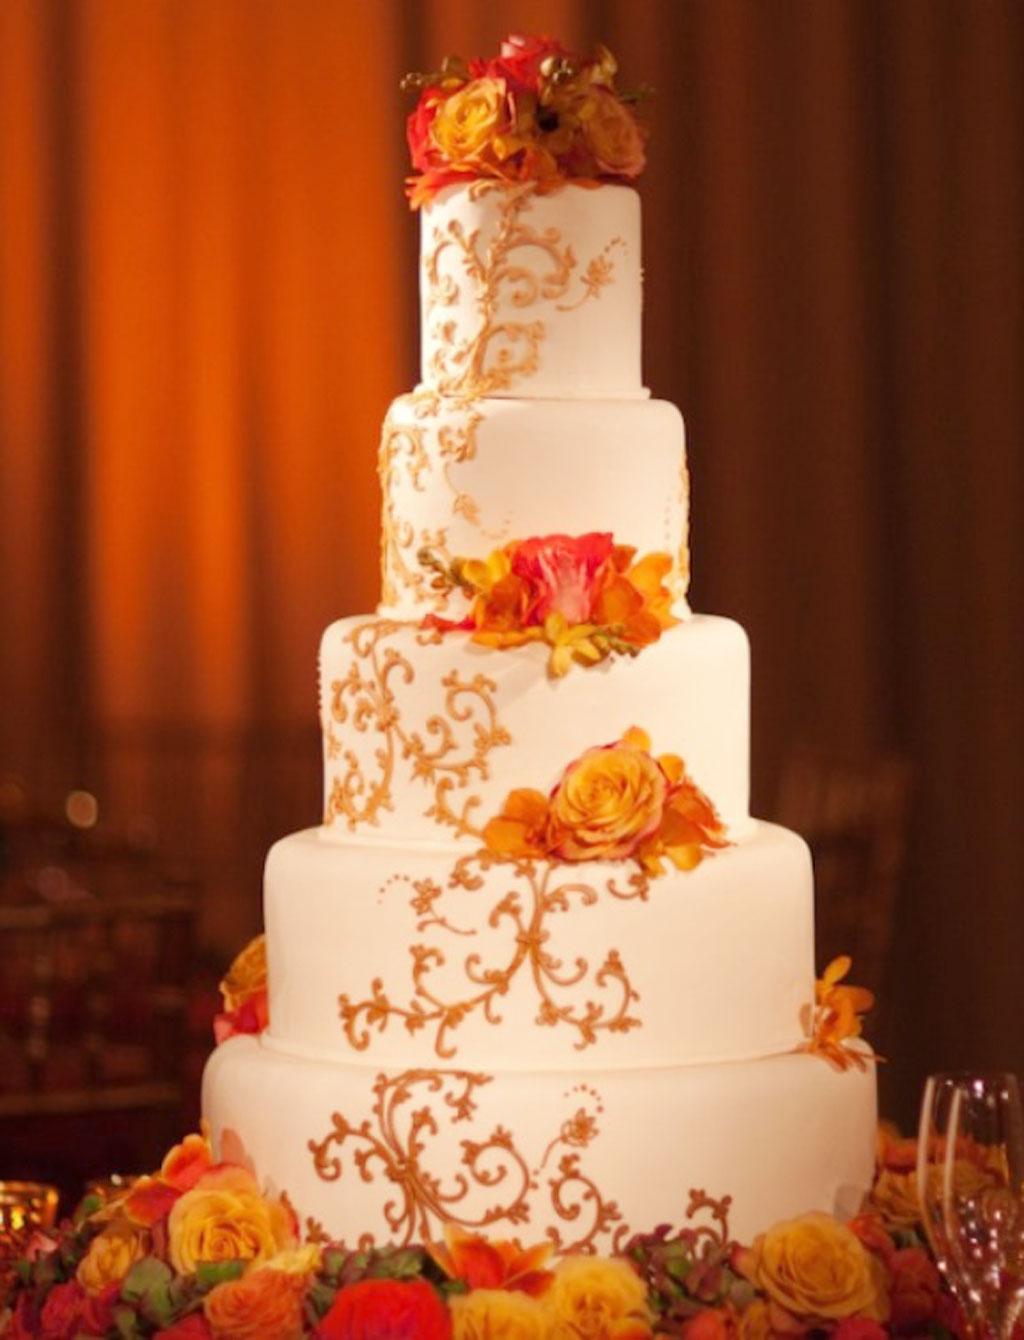 Fall Theme Orange Wedding Cake Wedding Cake